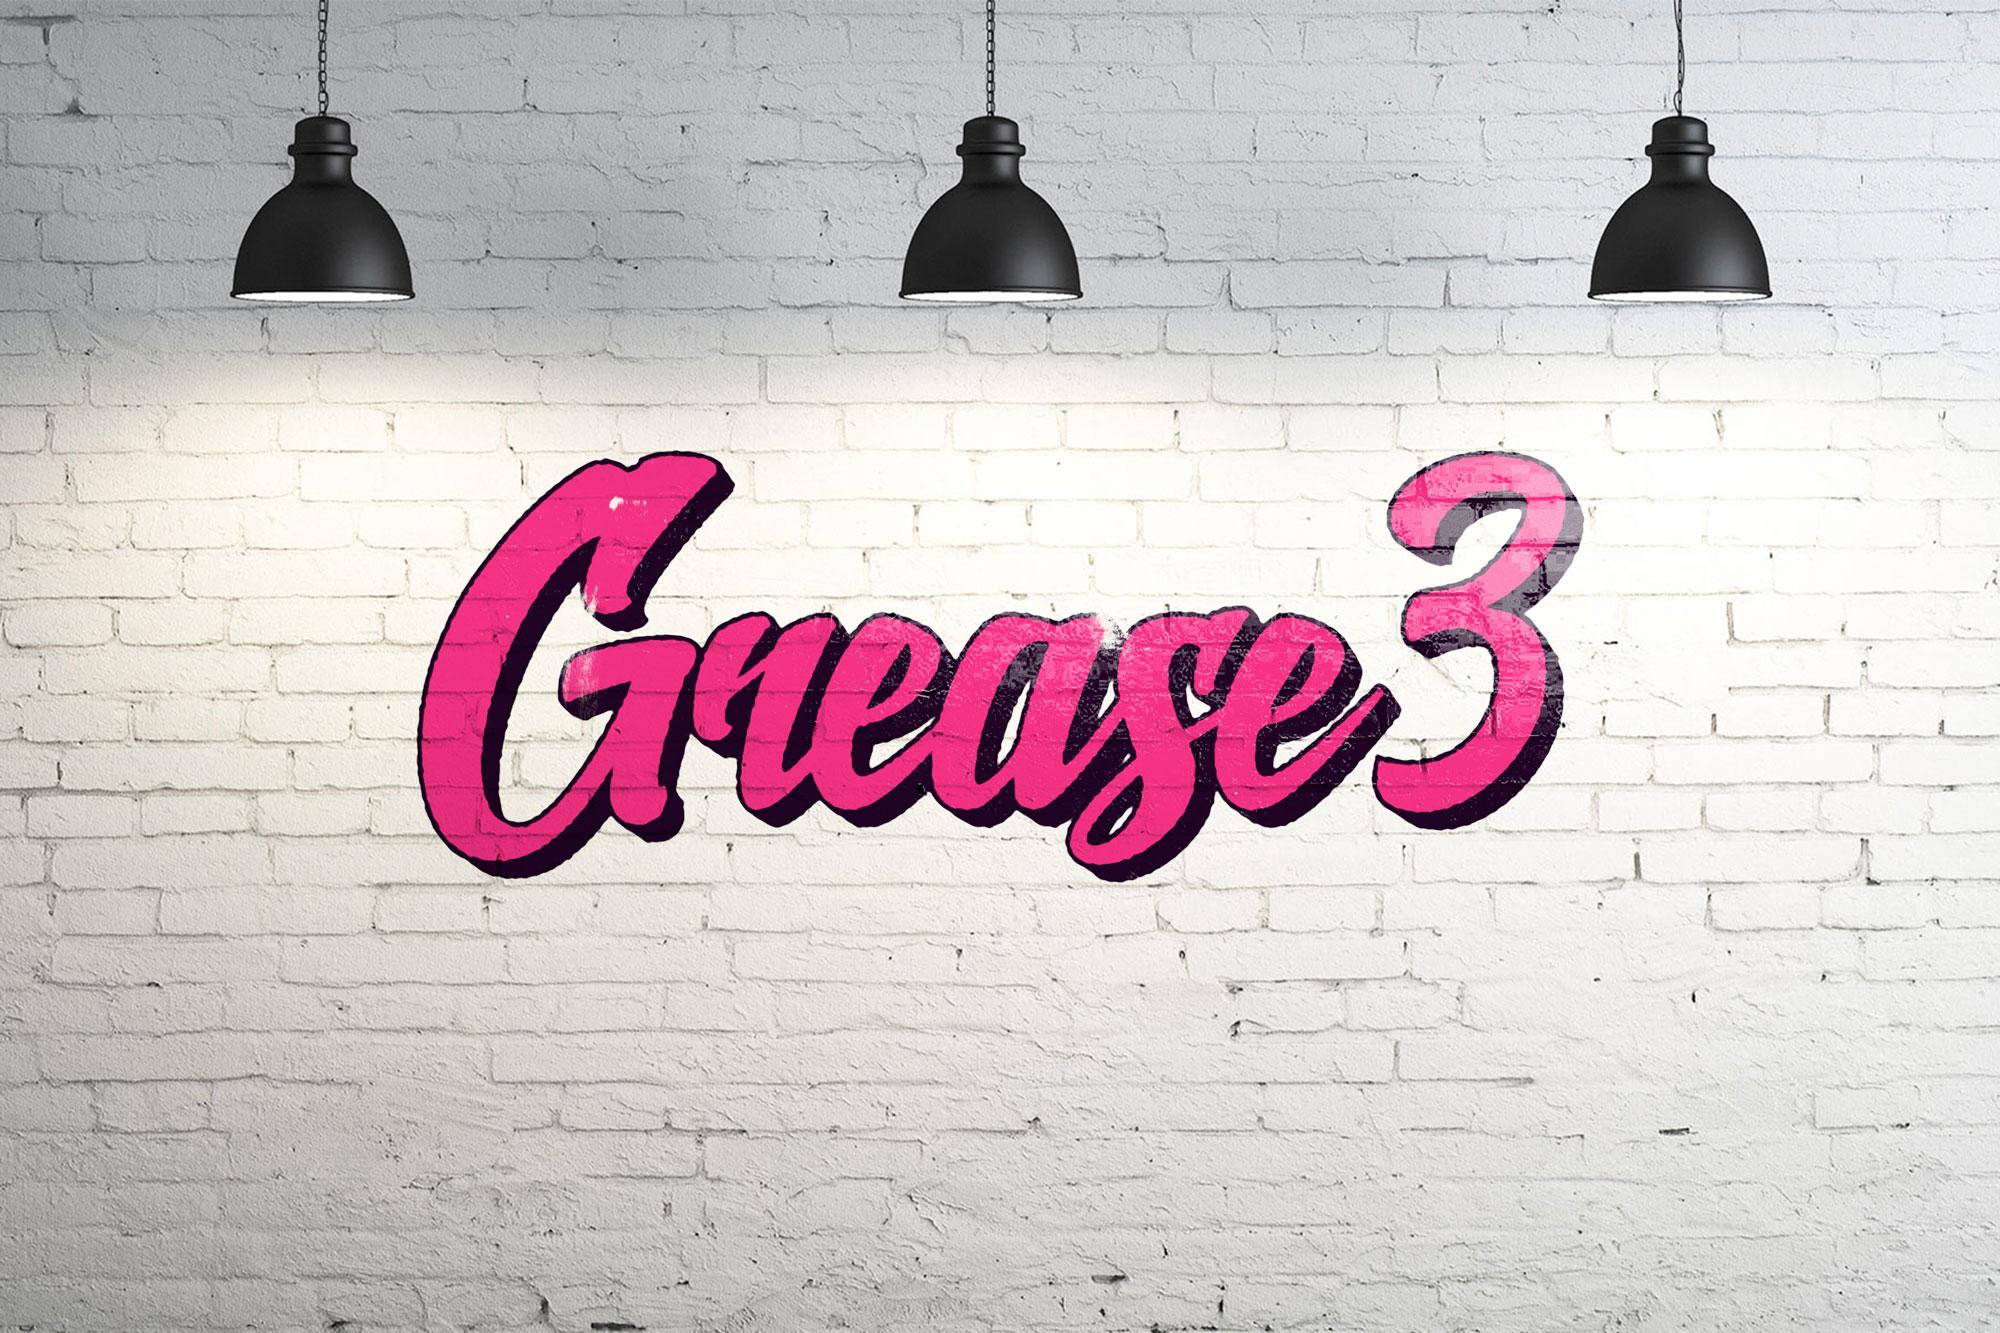 Grease_Wall_site.jpg